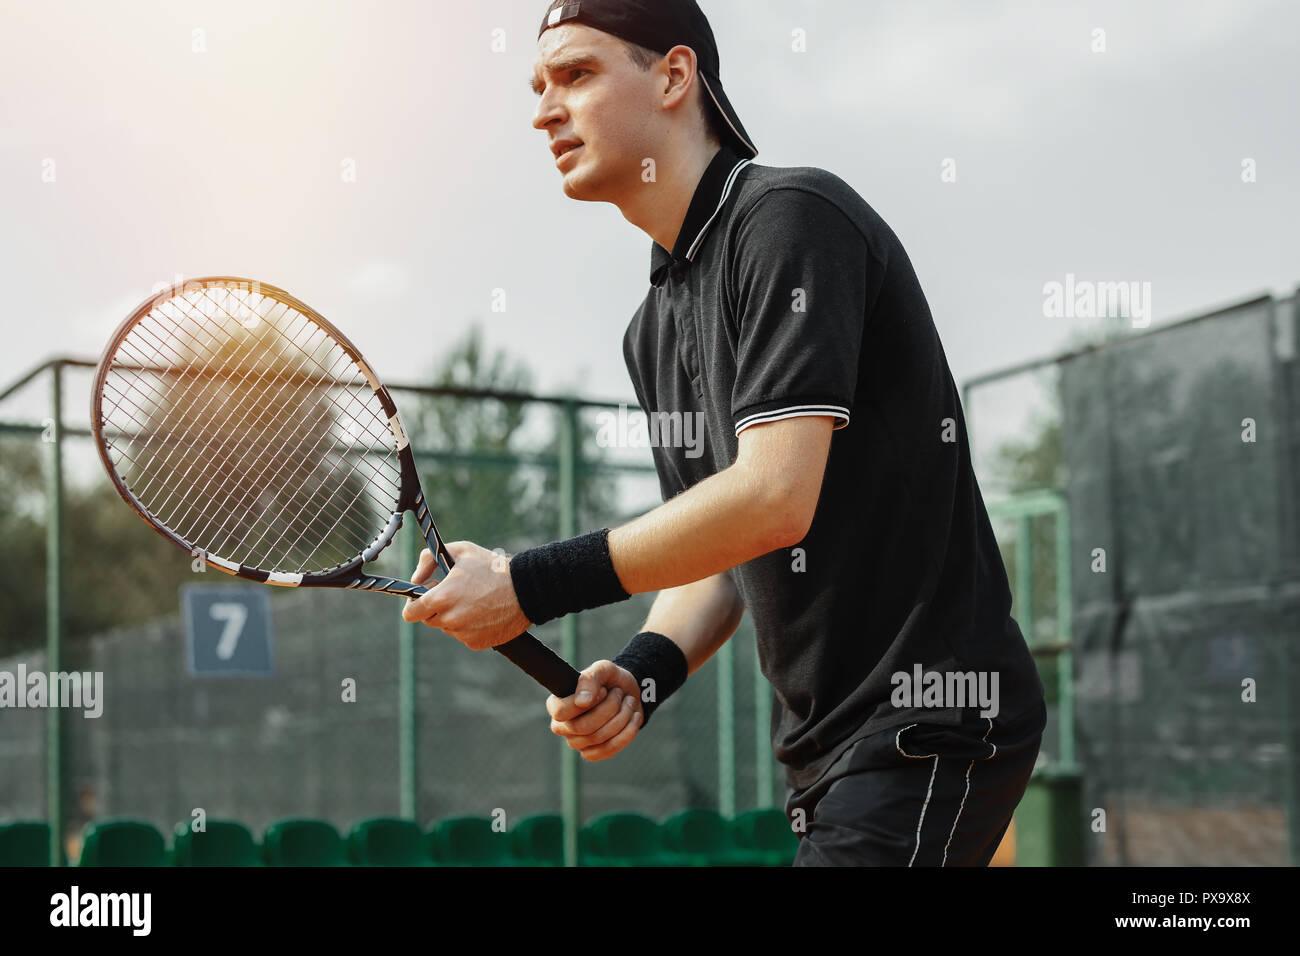 Der Mann hält Tennisschläger in beide Hände zu begradigen. Stockbild